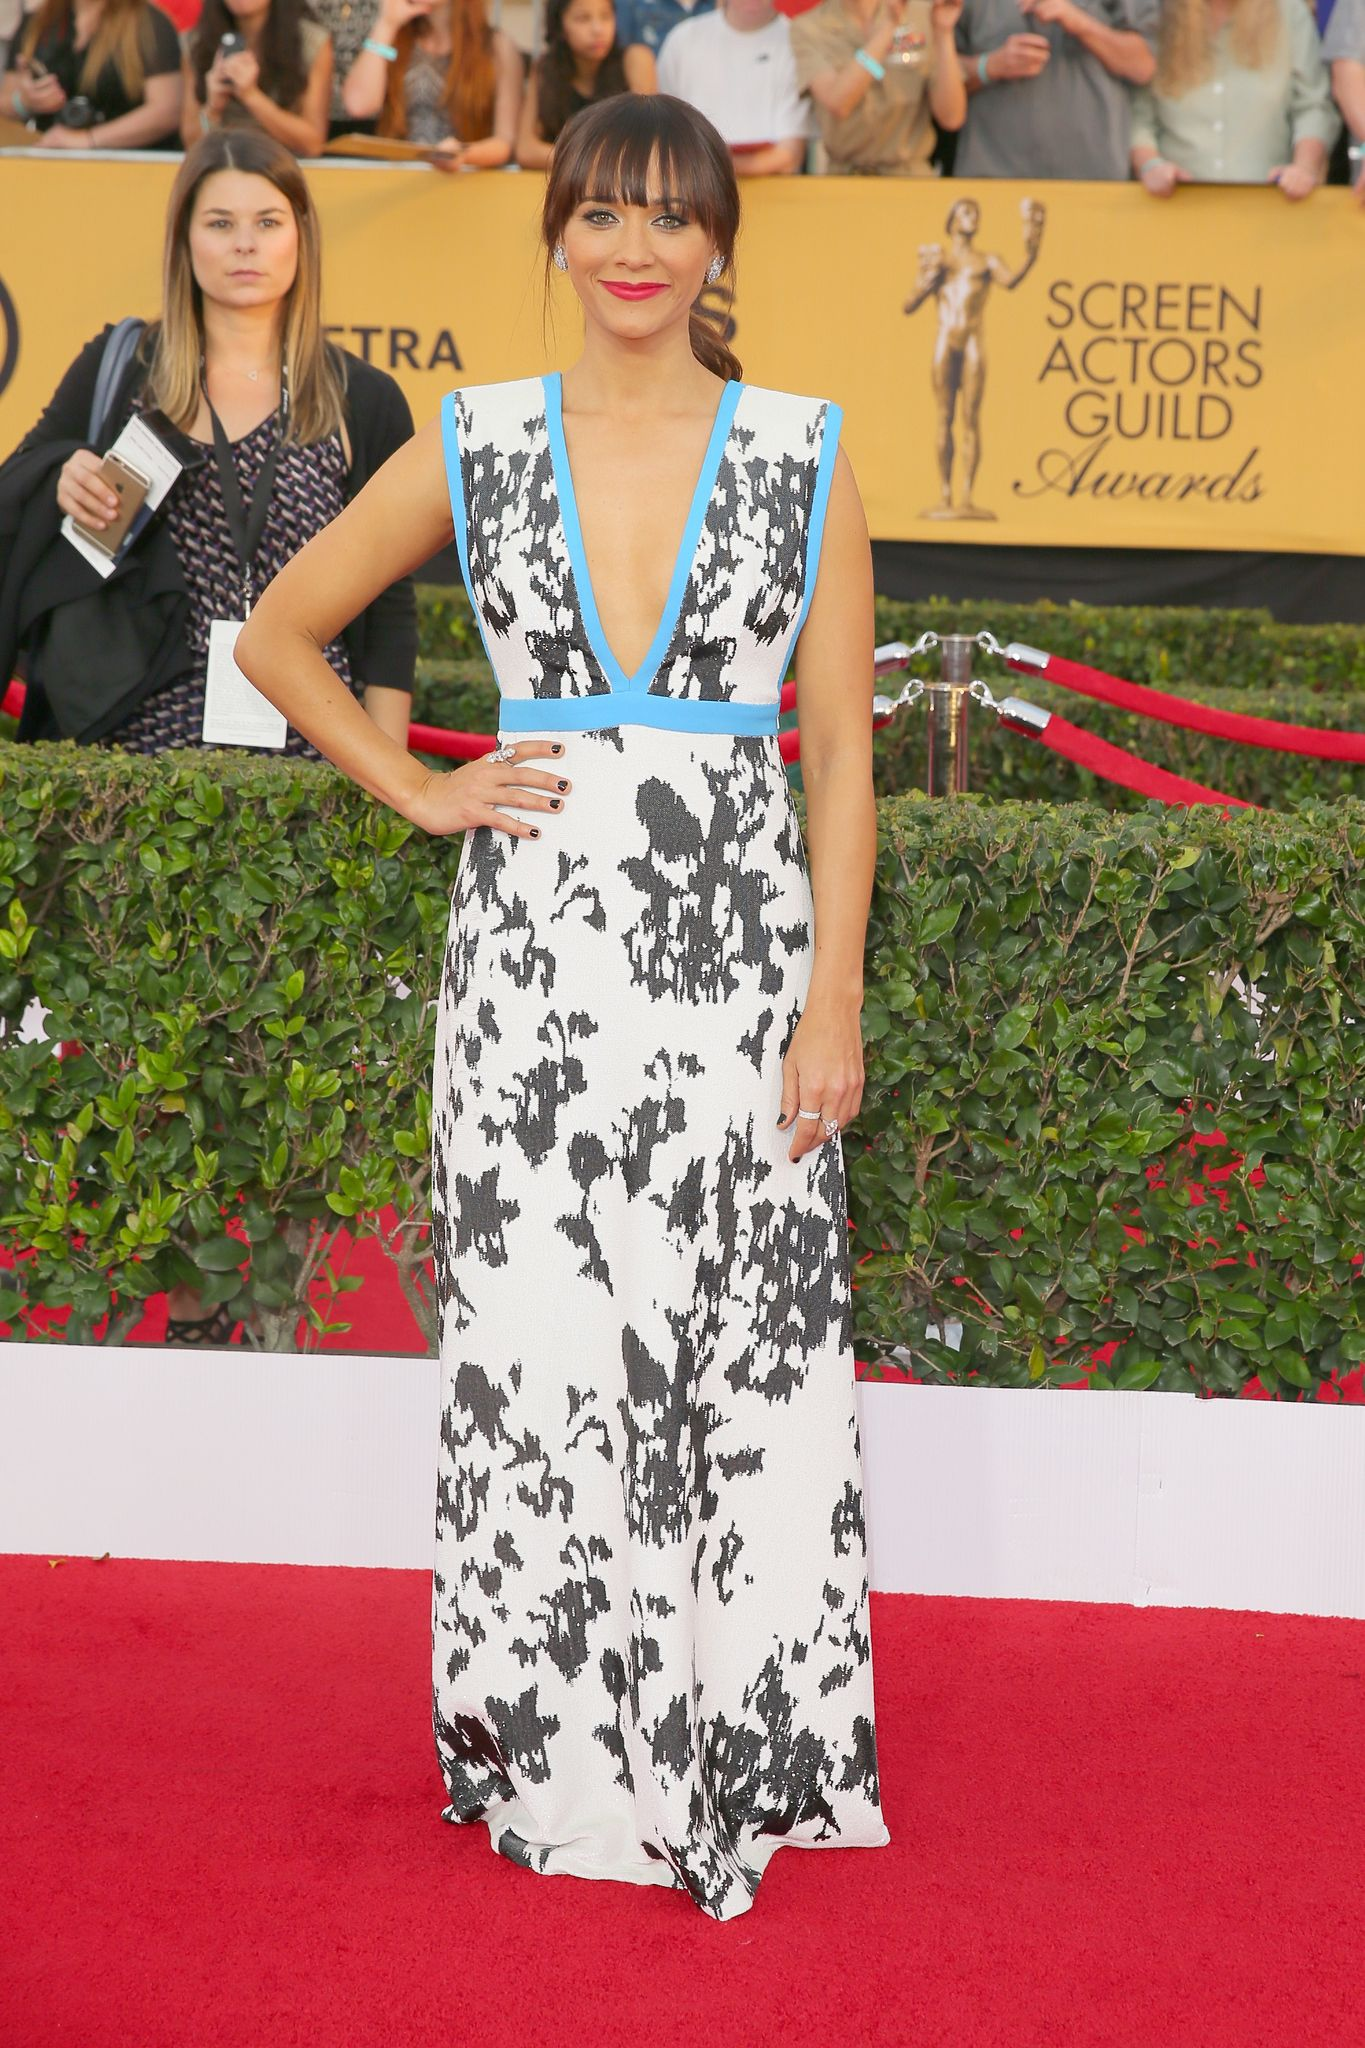 2015 Screen Actors Guild Awards - All Photos